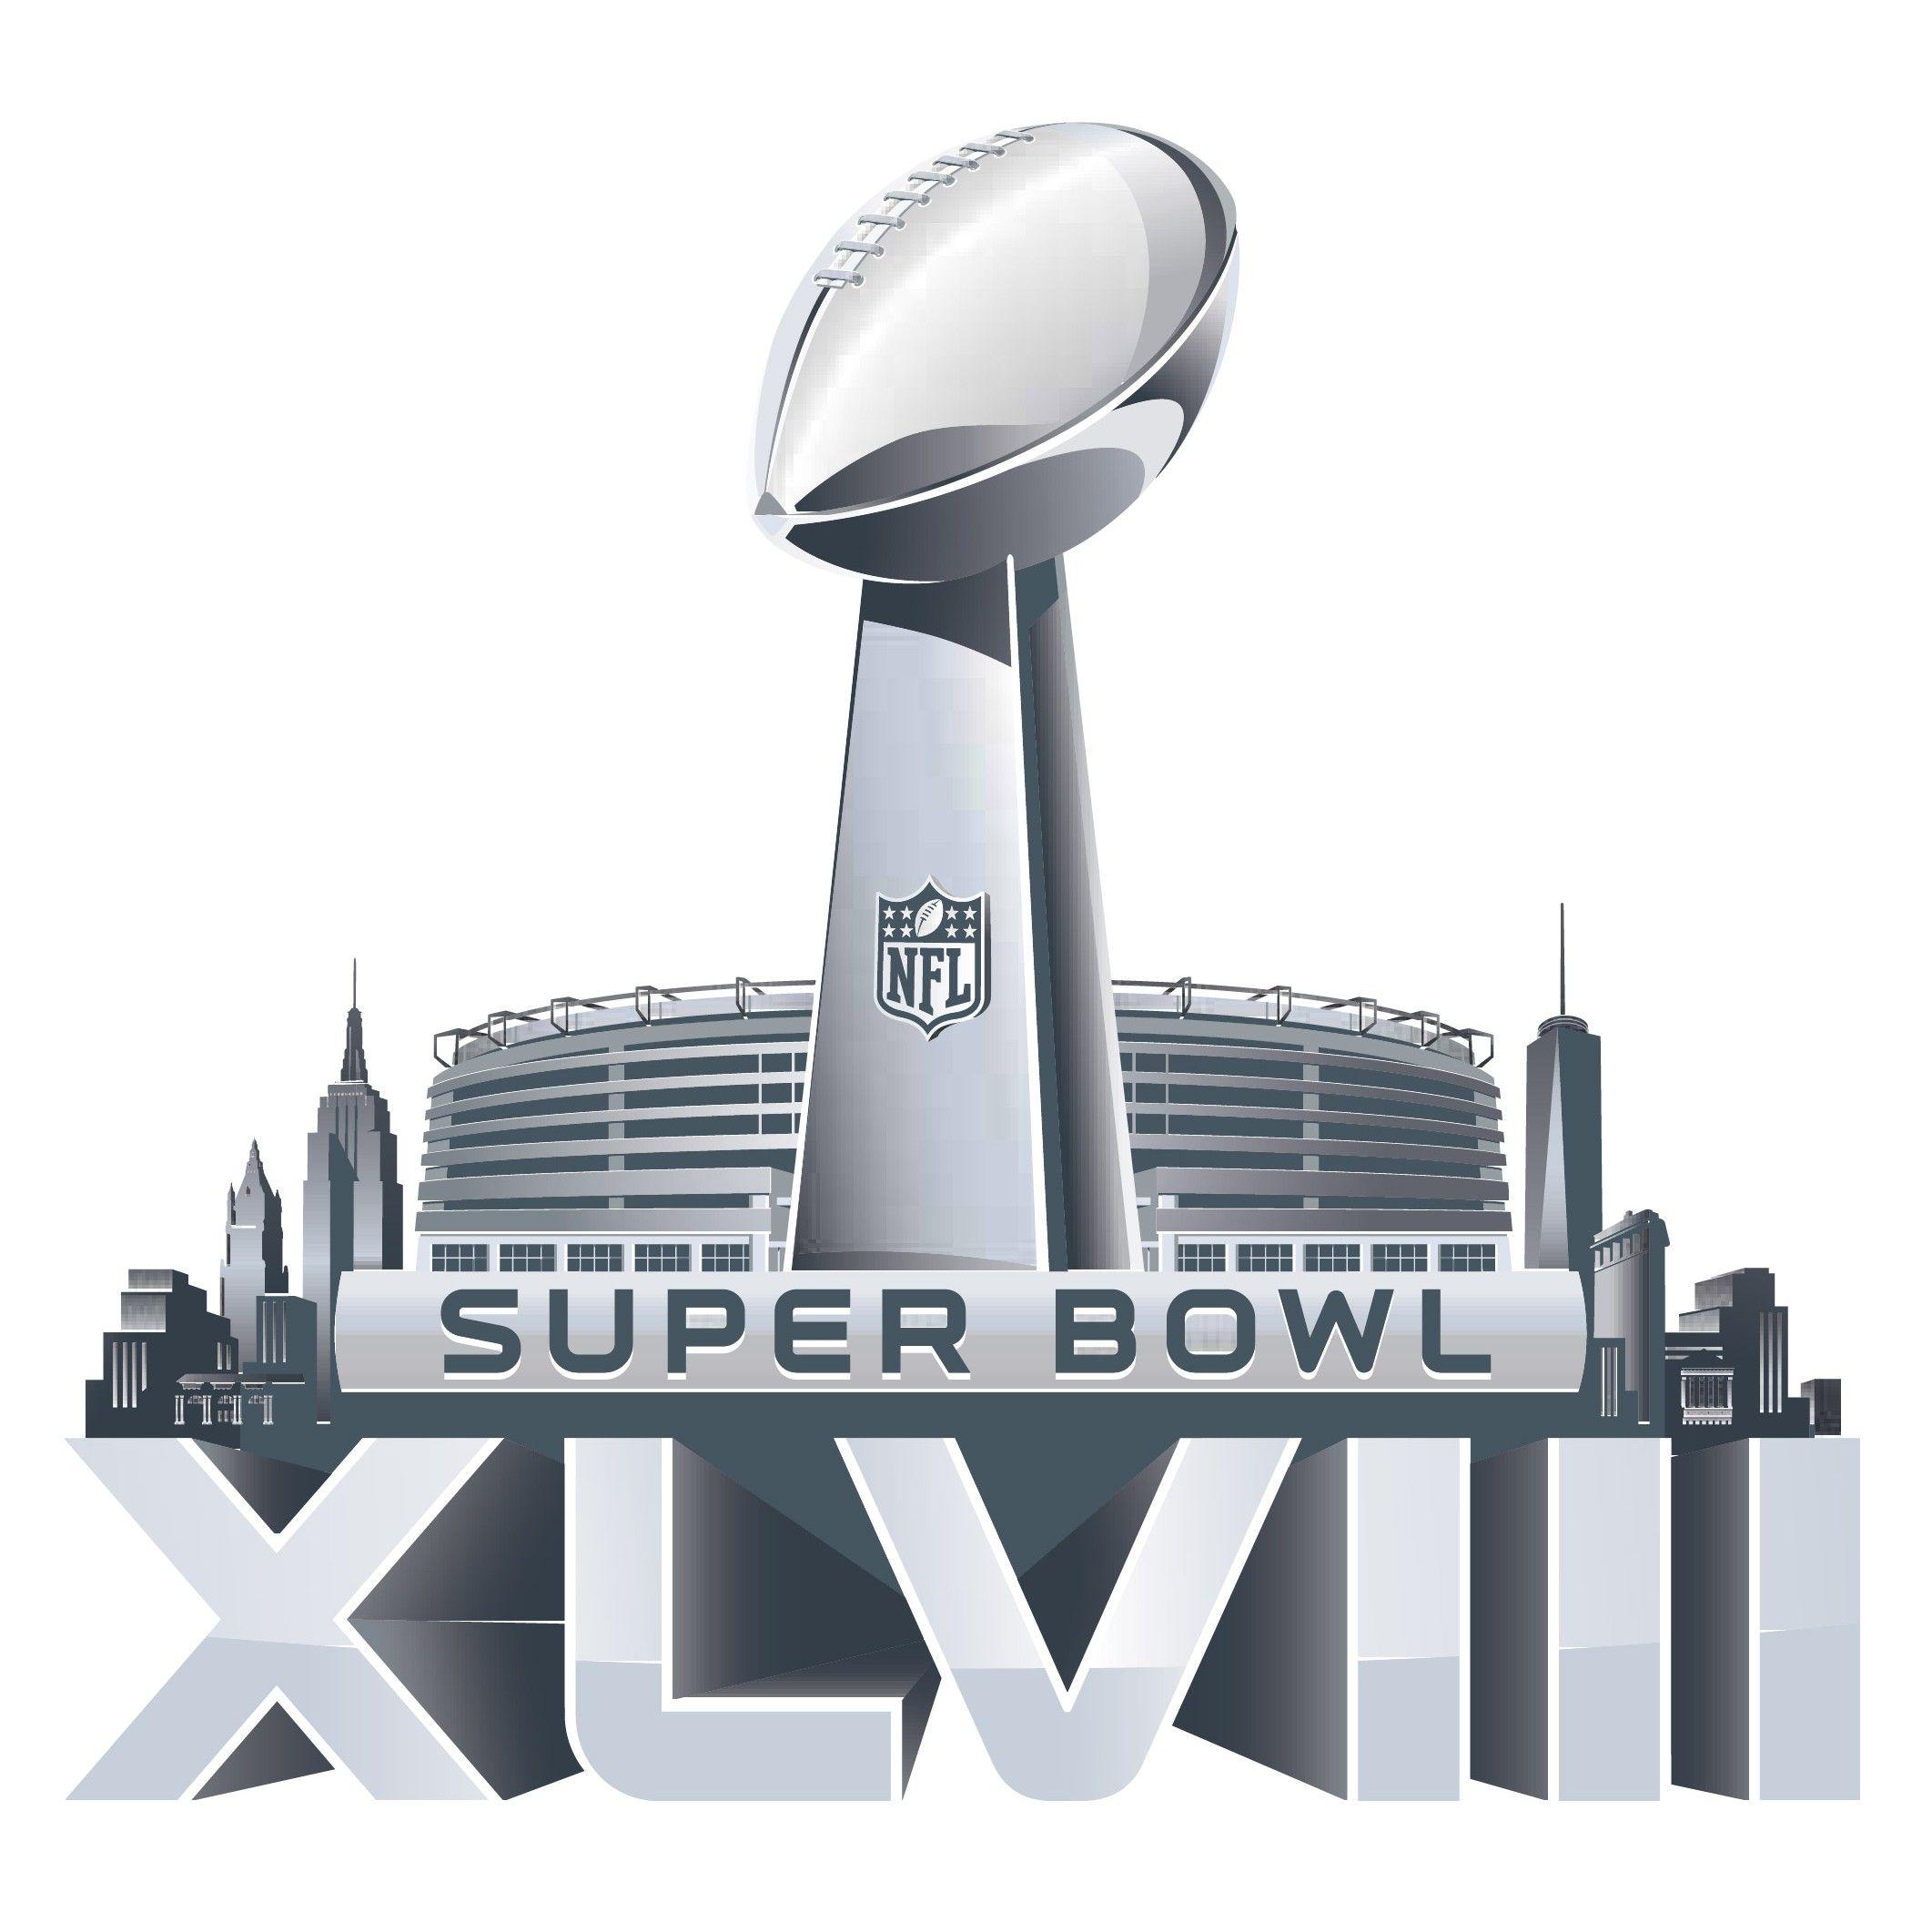 Super Bowl Xlviii Logo Nfl Free Company Logo Downloads Brand Emblems Super Bowl Nfl Super Bowl 2015